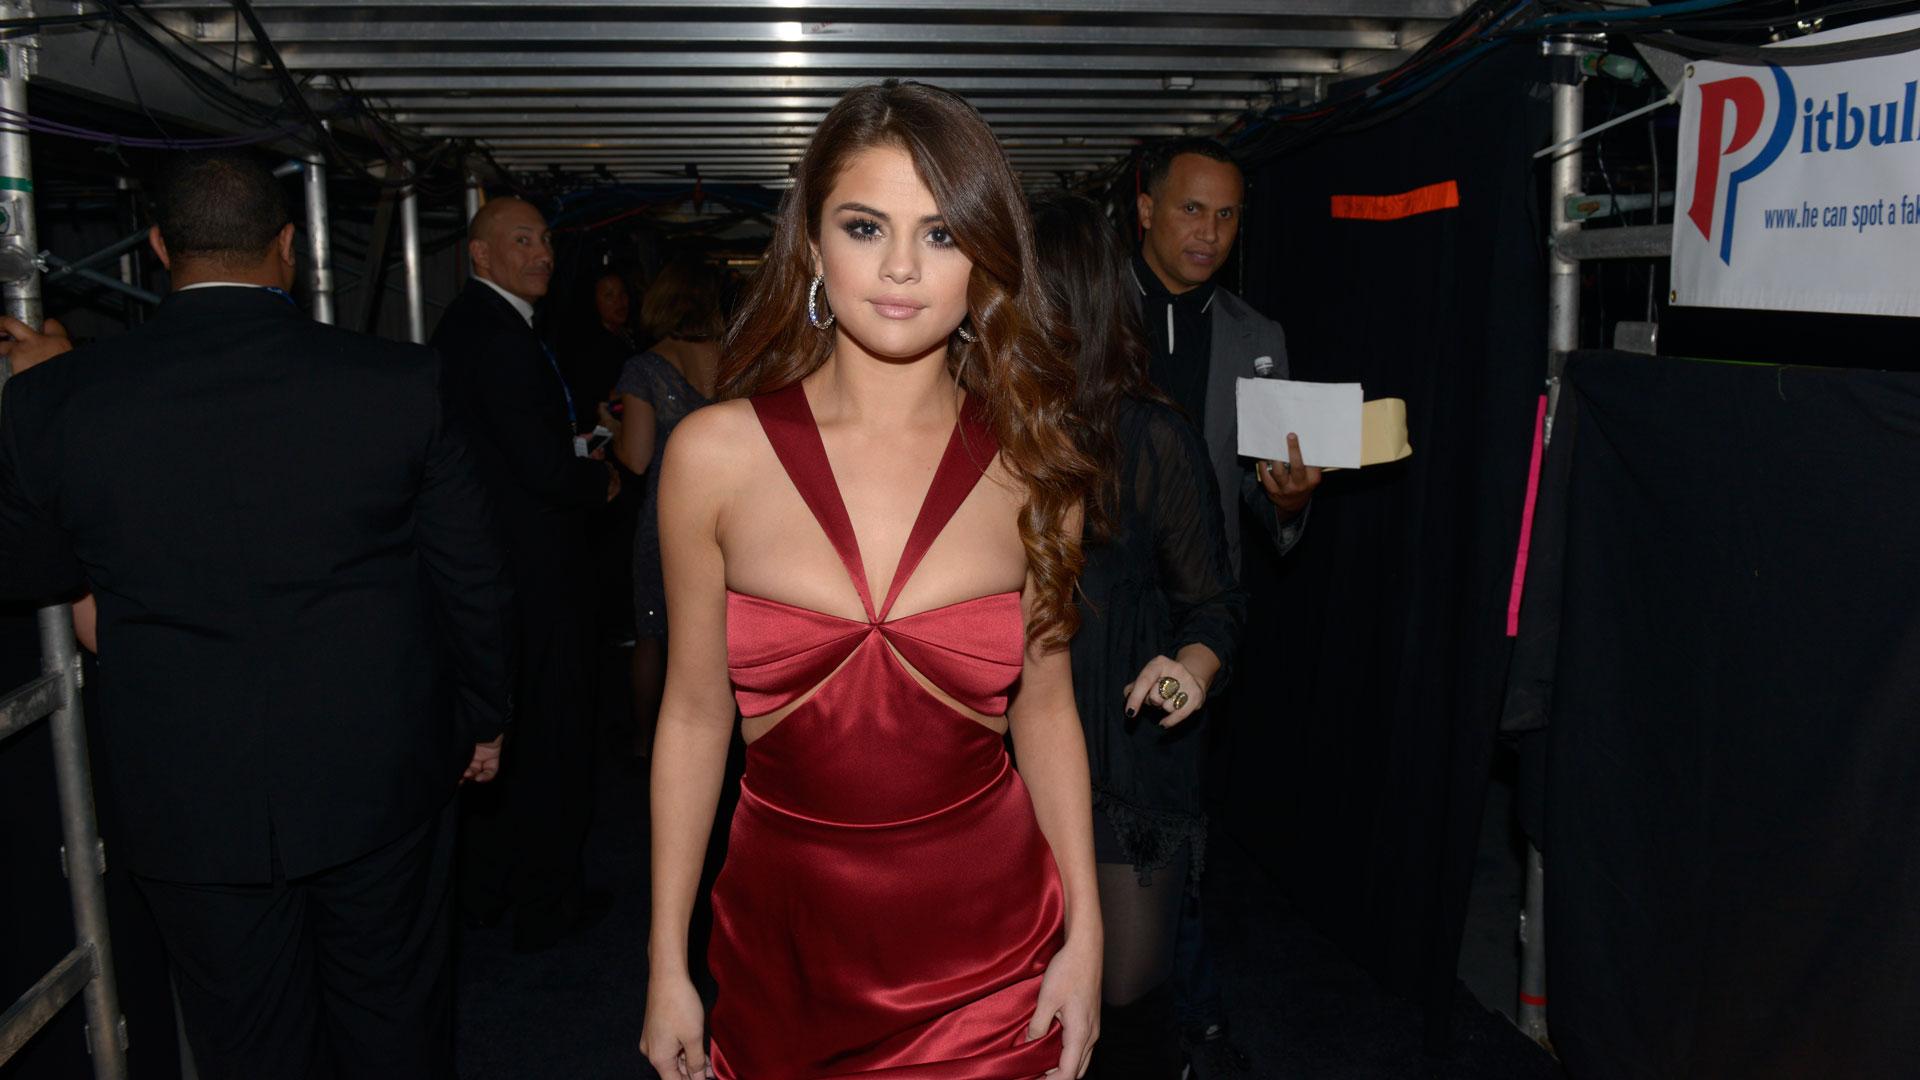 Selena Gomez struts her stuff in a sexy, red dress